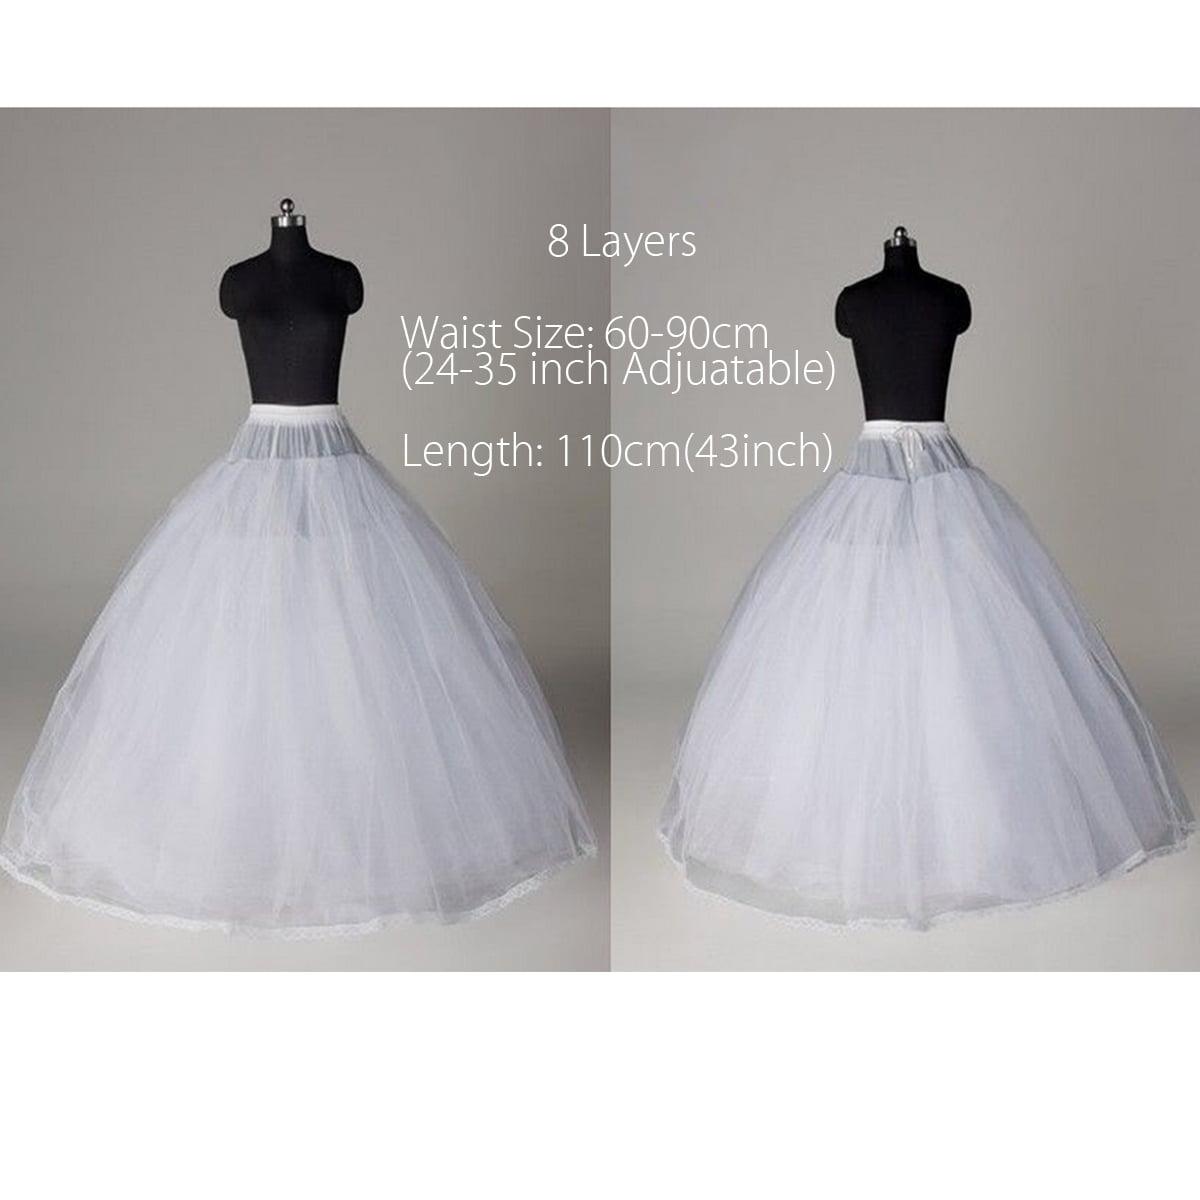 43/'/' 110cm Wedding Bridal Underskirt Petticoat Skirt Prom Dress Crinoline Party